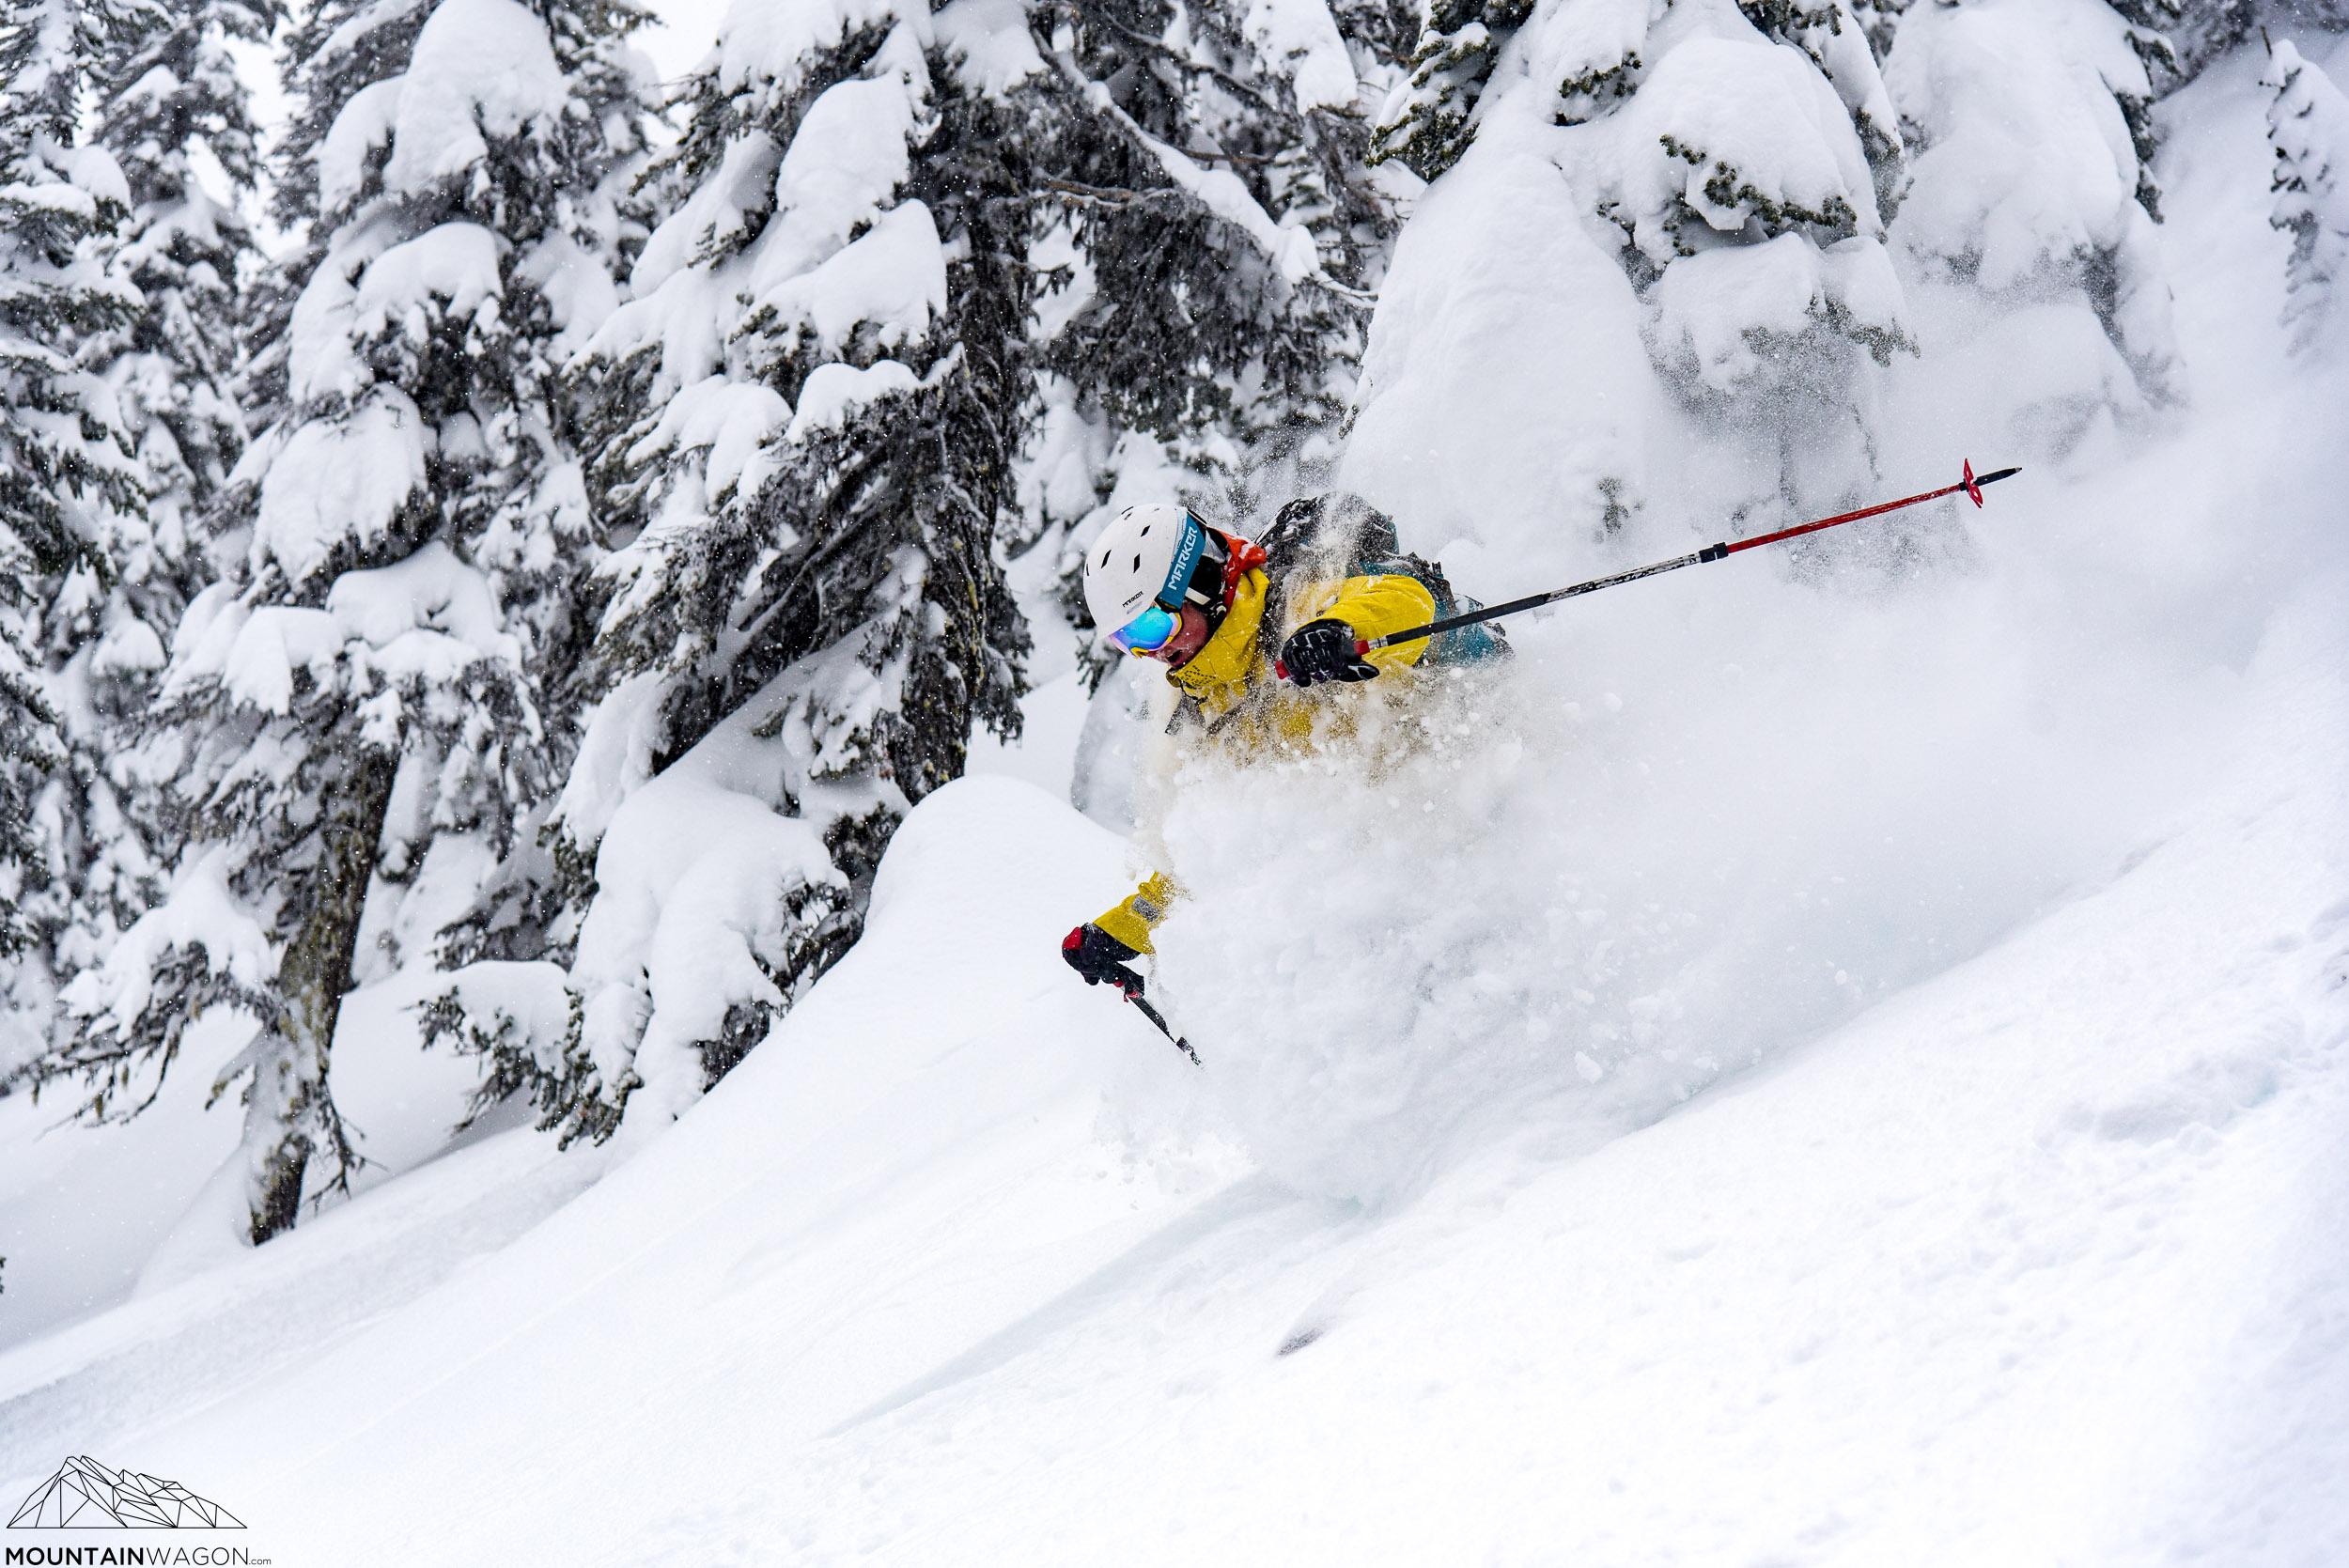 kootenay pass skiing powder lightning strike cabin